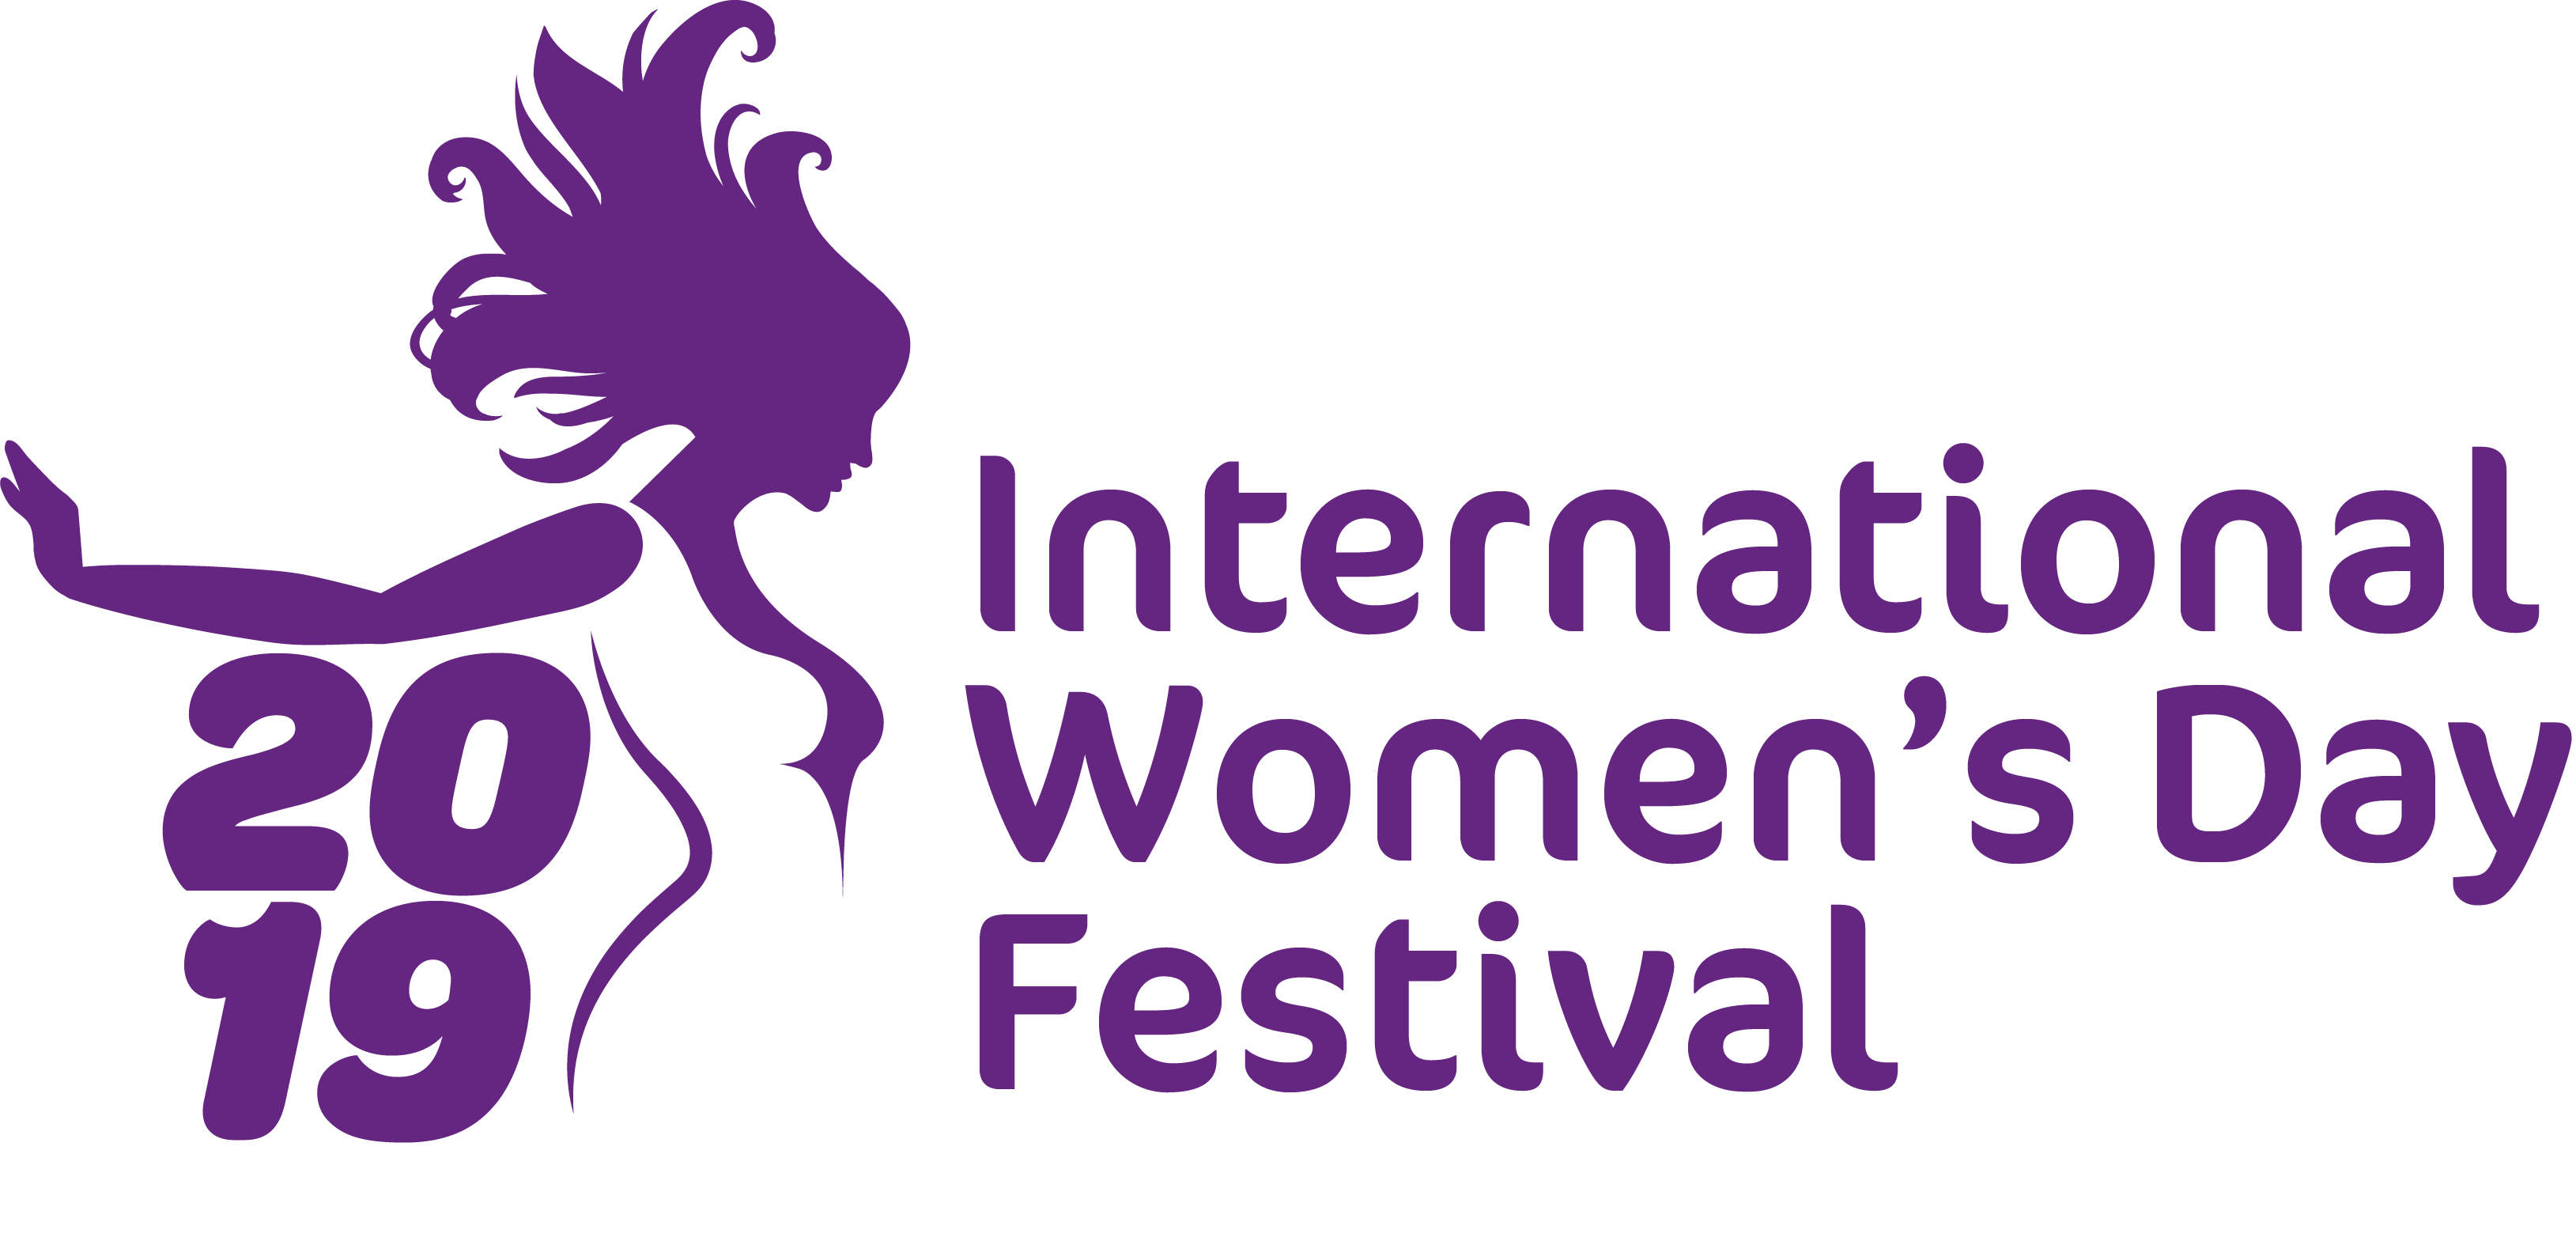 International Womens Day Festival 2019 The Washington Group